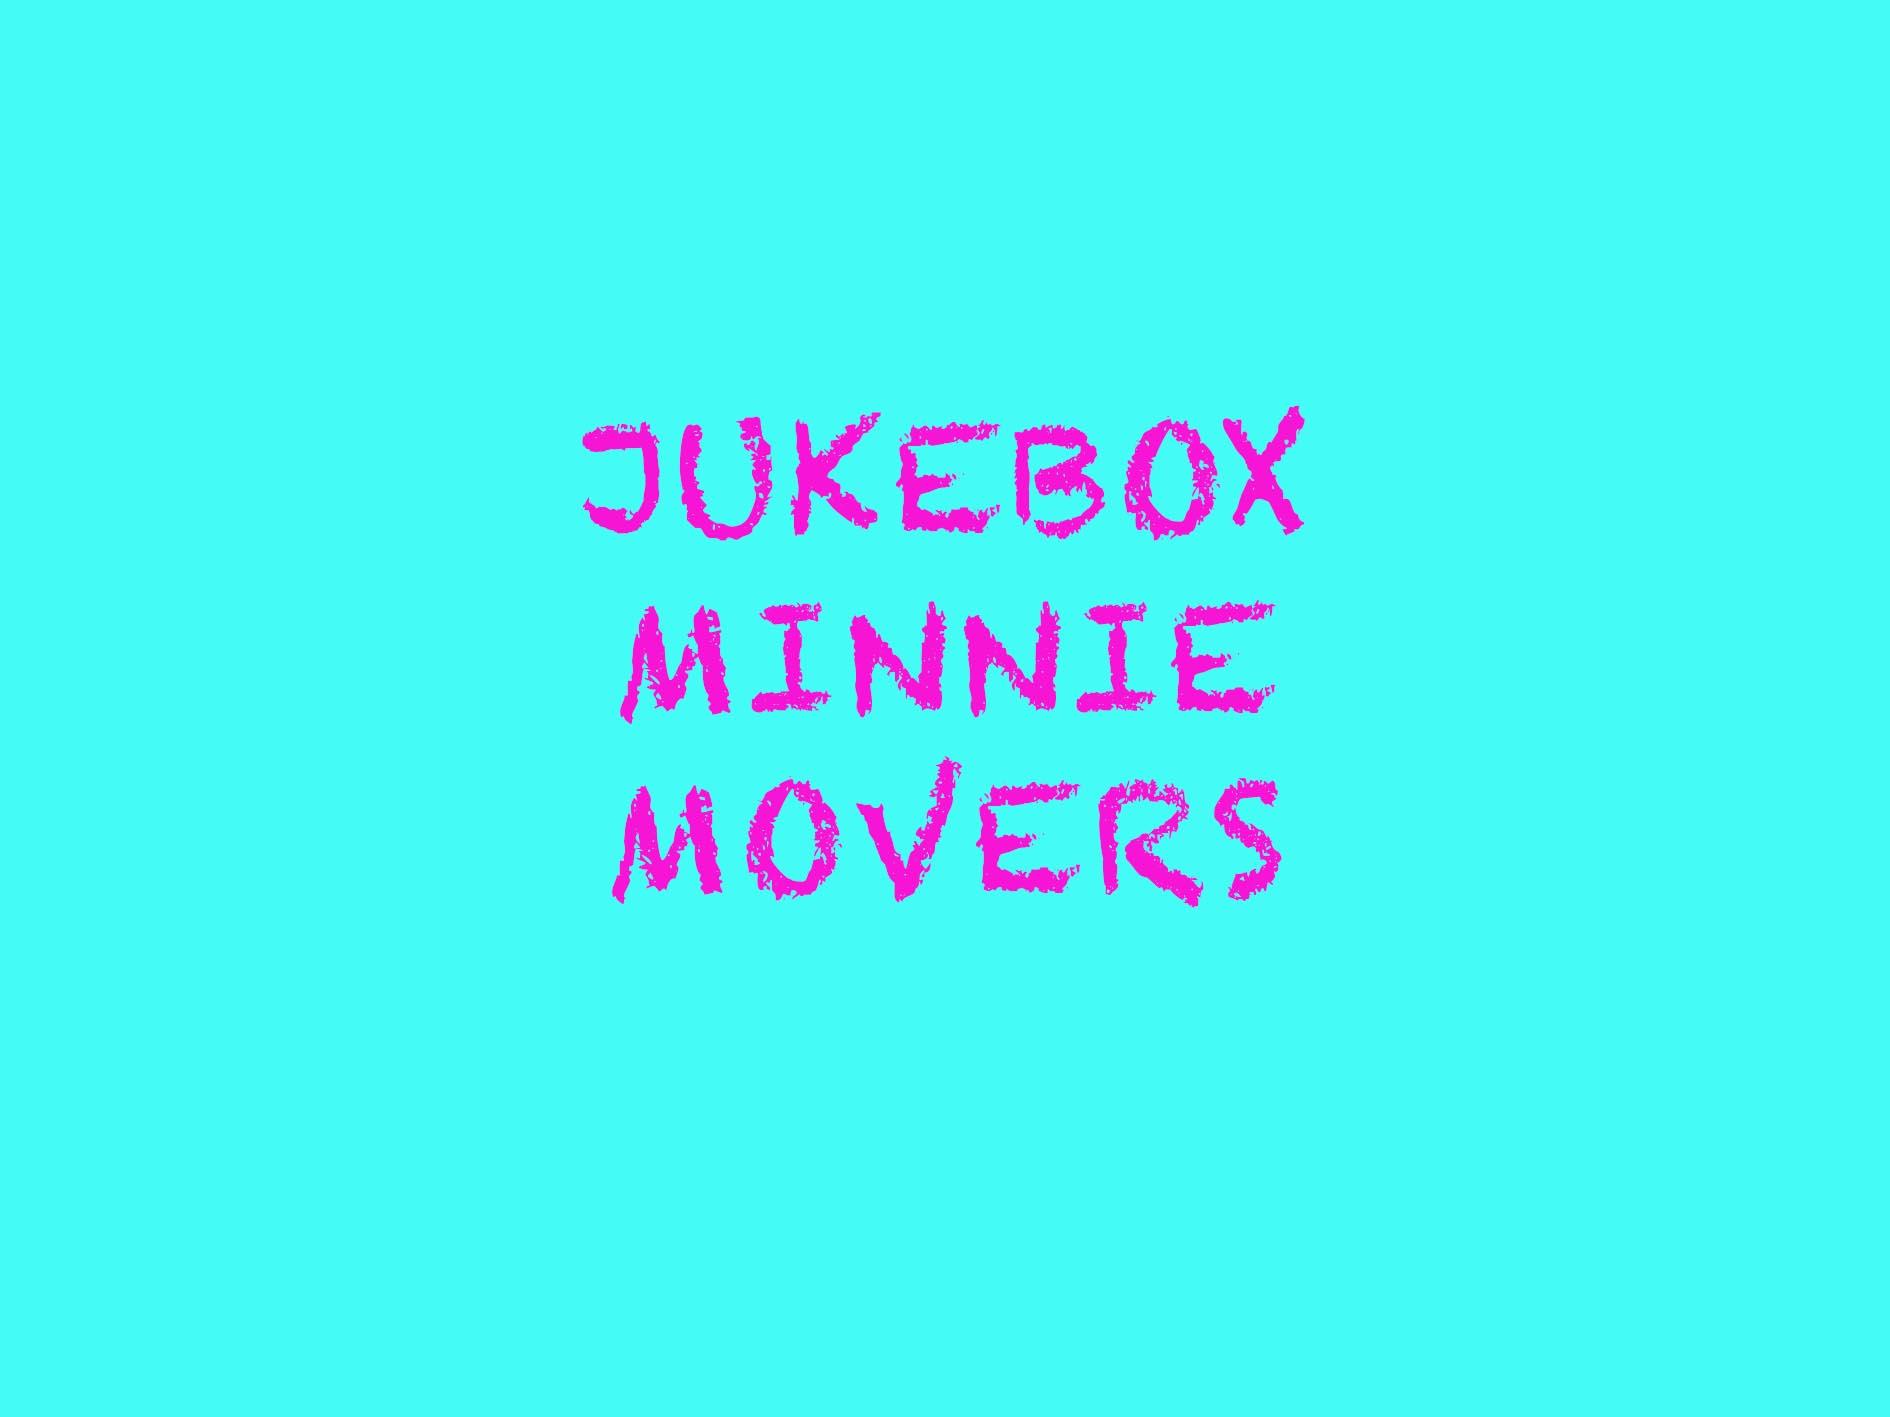 minnie movers.jpg